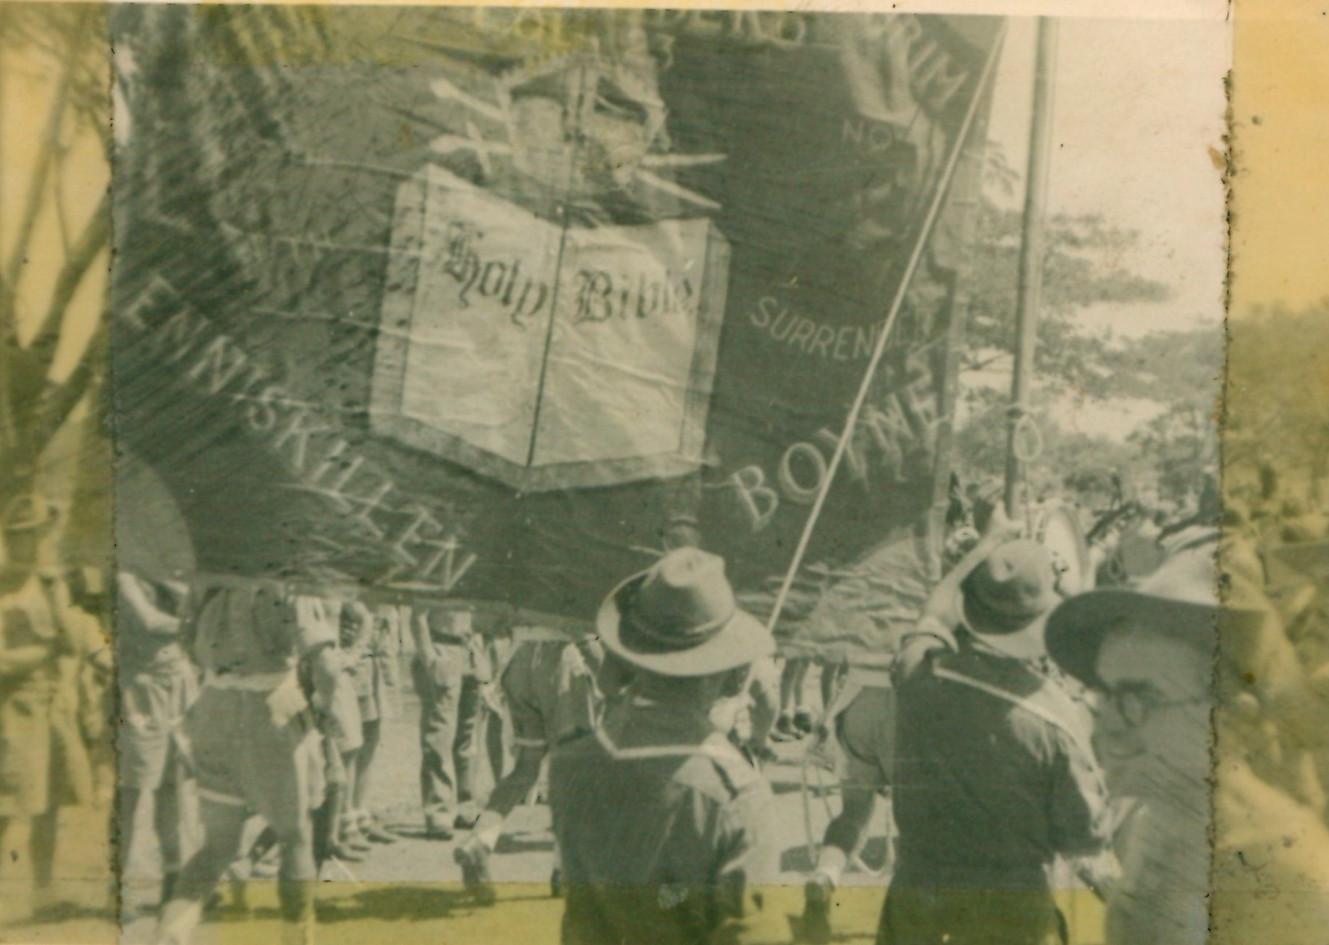 SAD153 Orange Banner on Parade in Burma